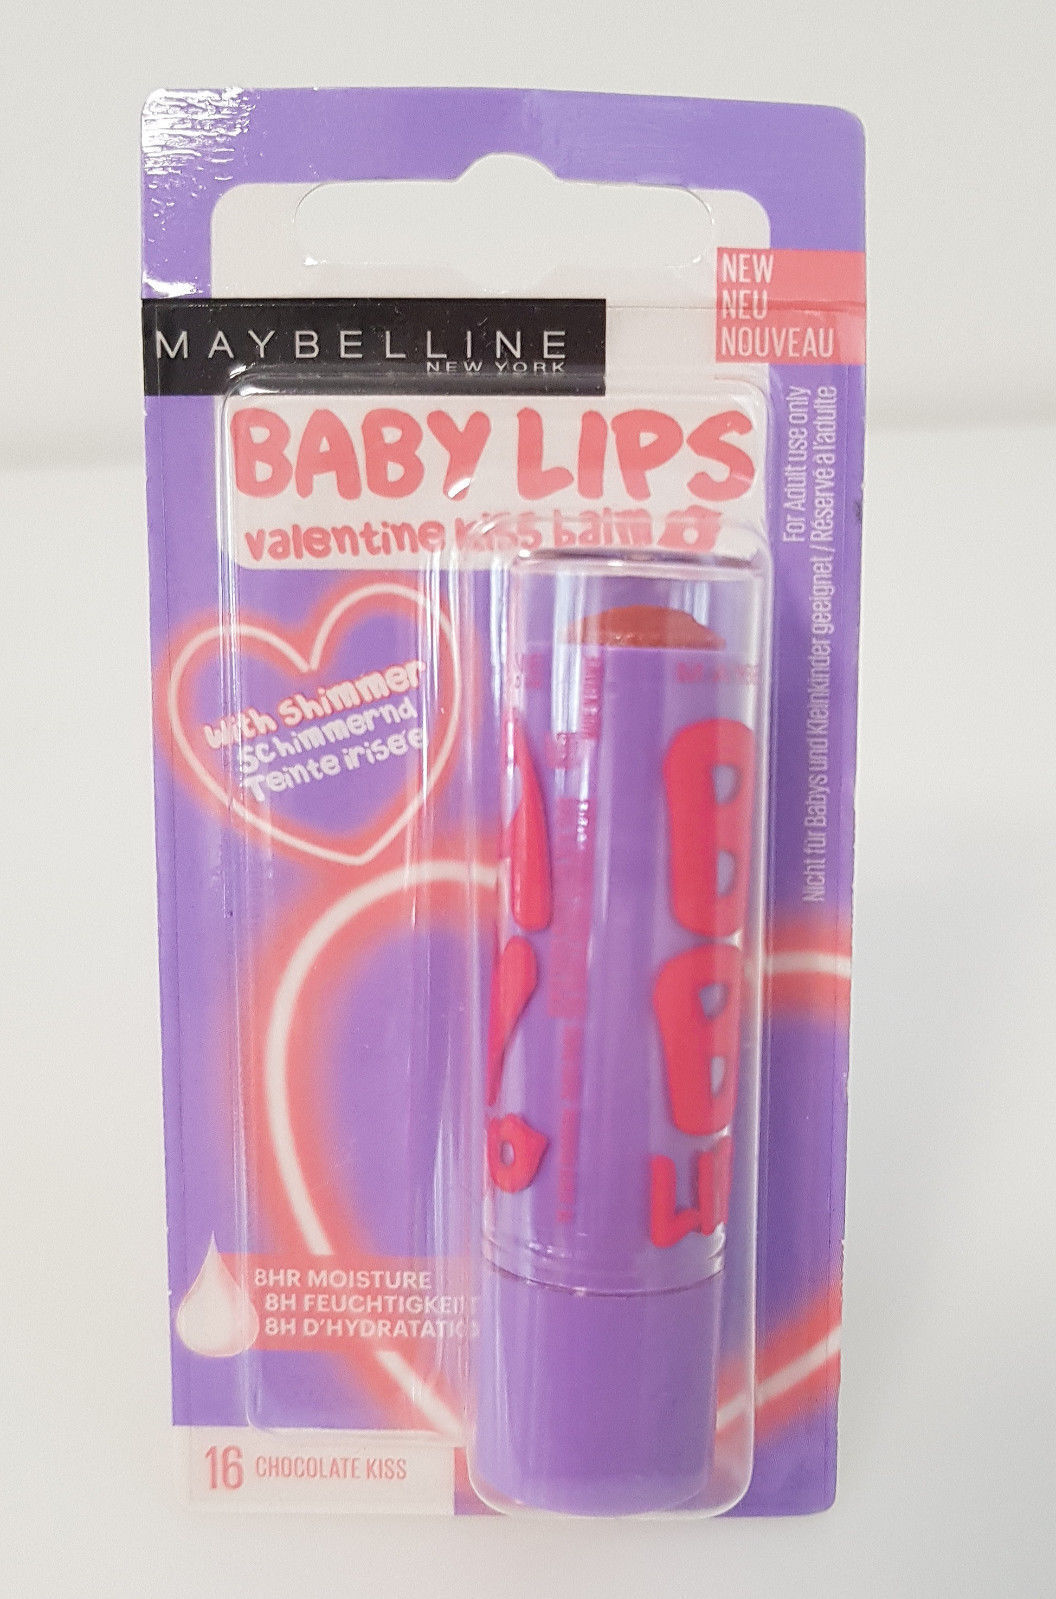 Maybelline Baby Lips  Lippenbalsam Lippenpflege Balsam 16 Chocolate Kiss  Neu